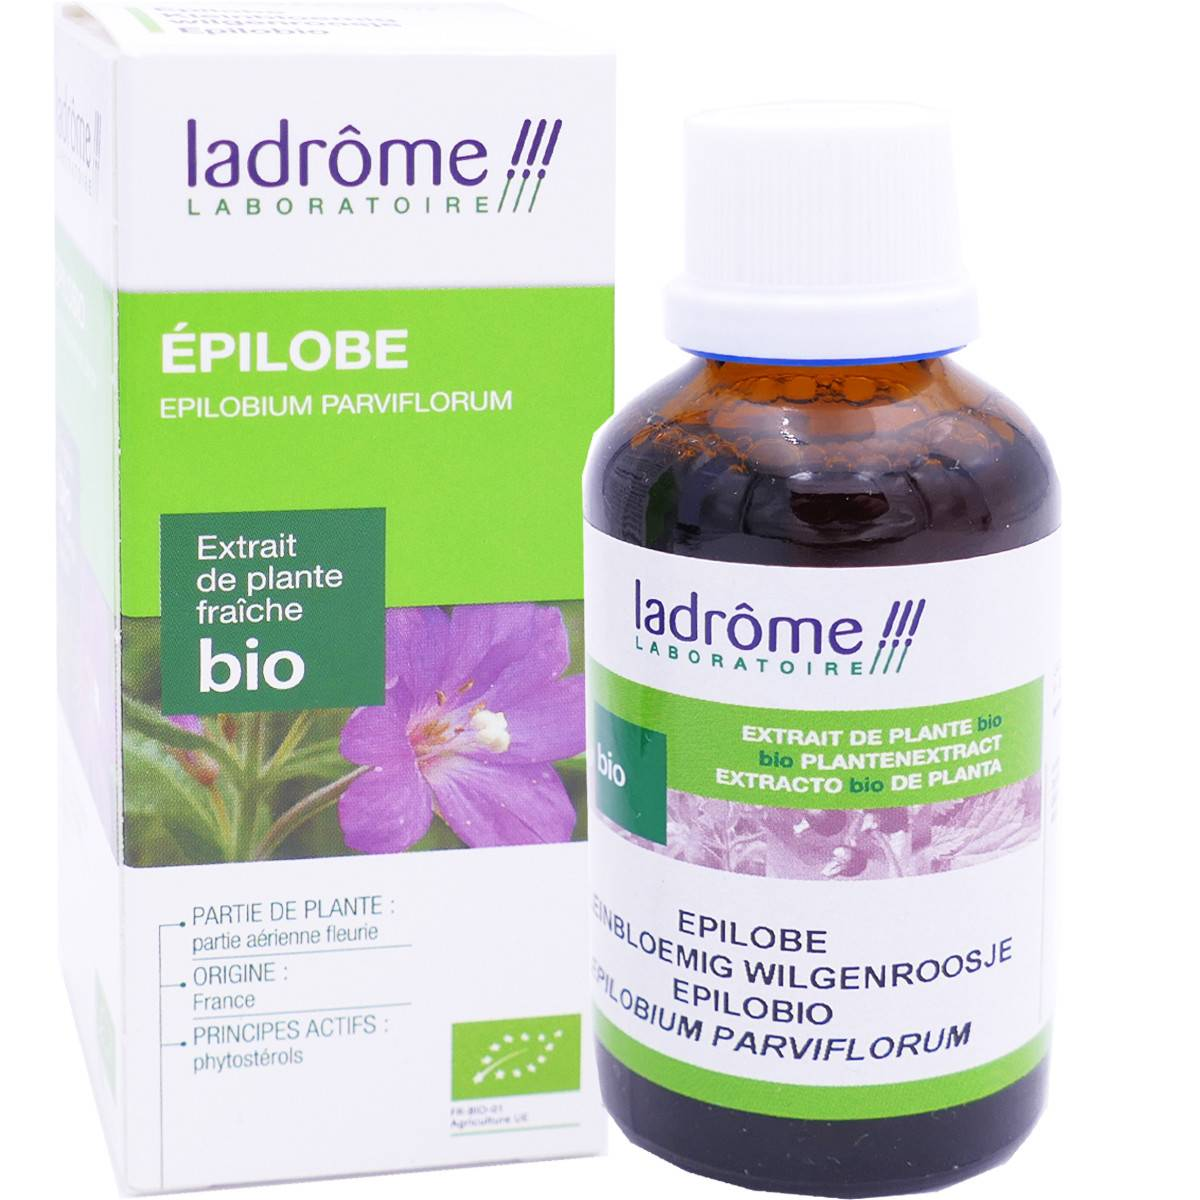 Ladrome epilobe bio 50 ml